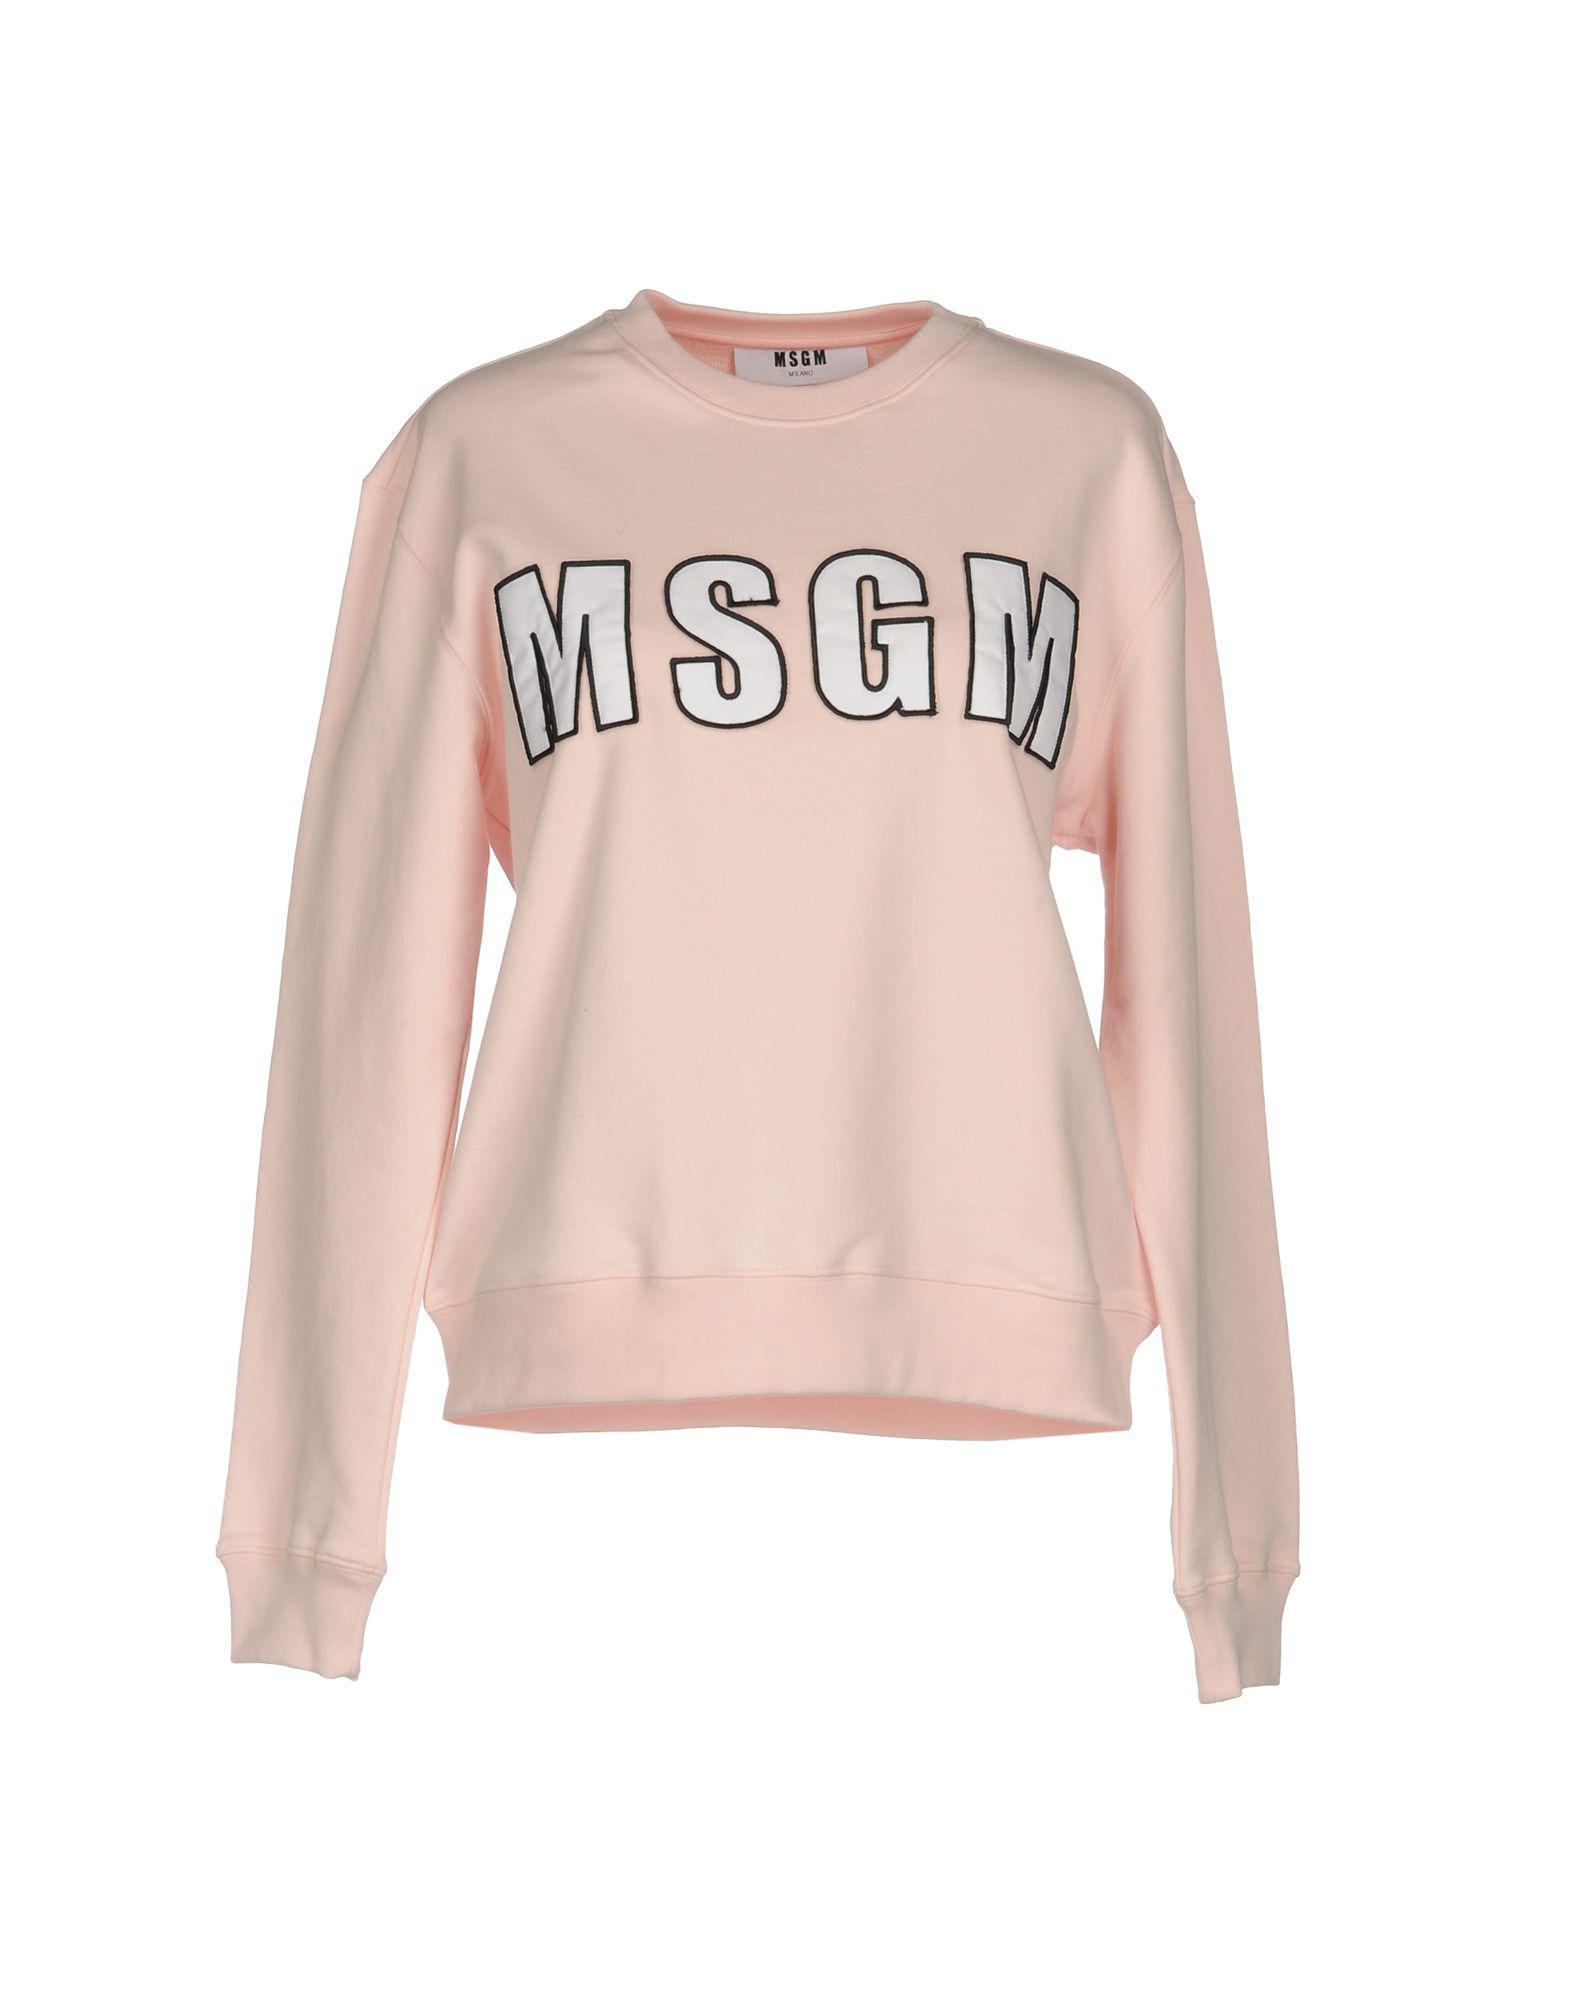 b610347baa Lyst - Msgm Sweatshirt in Pink